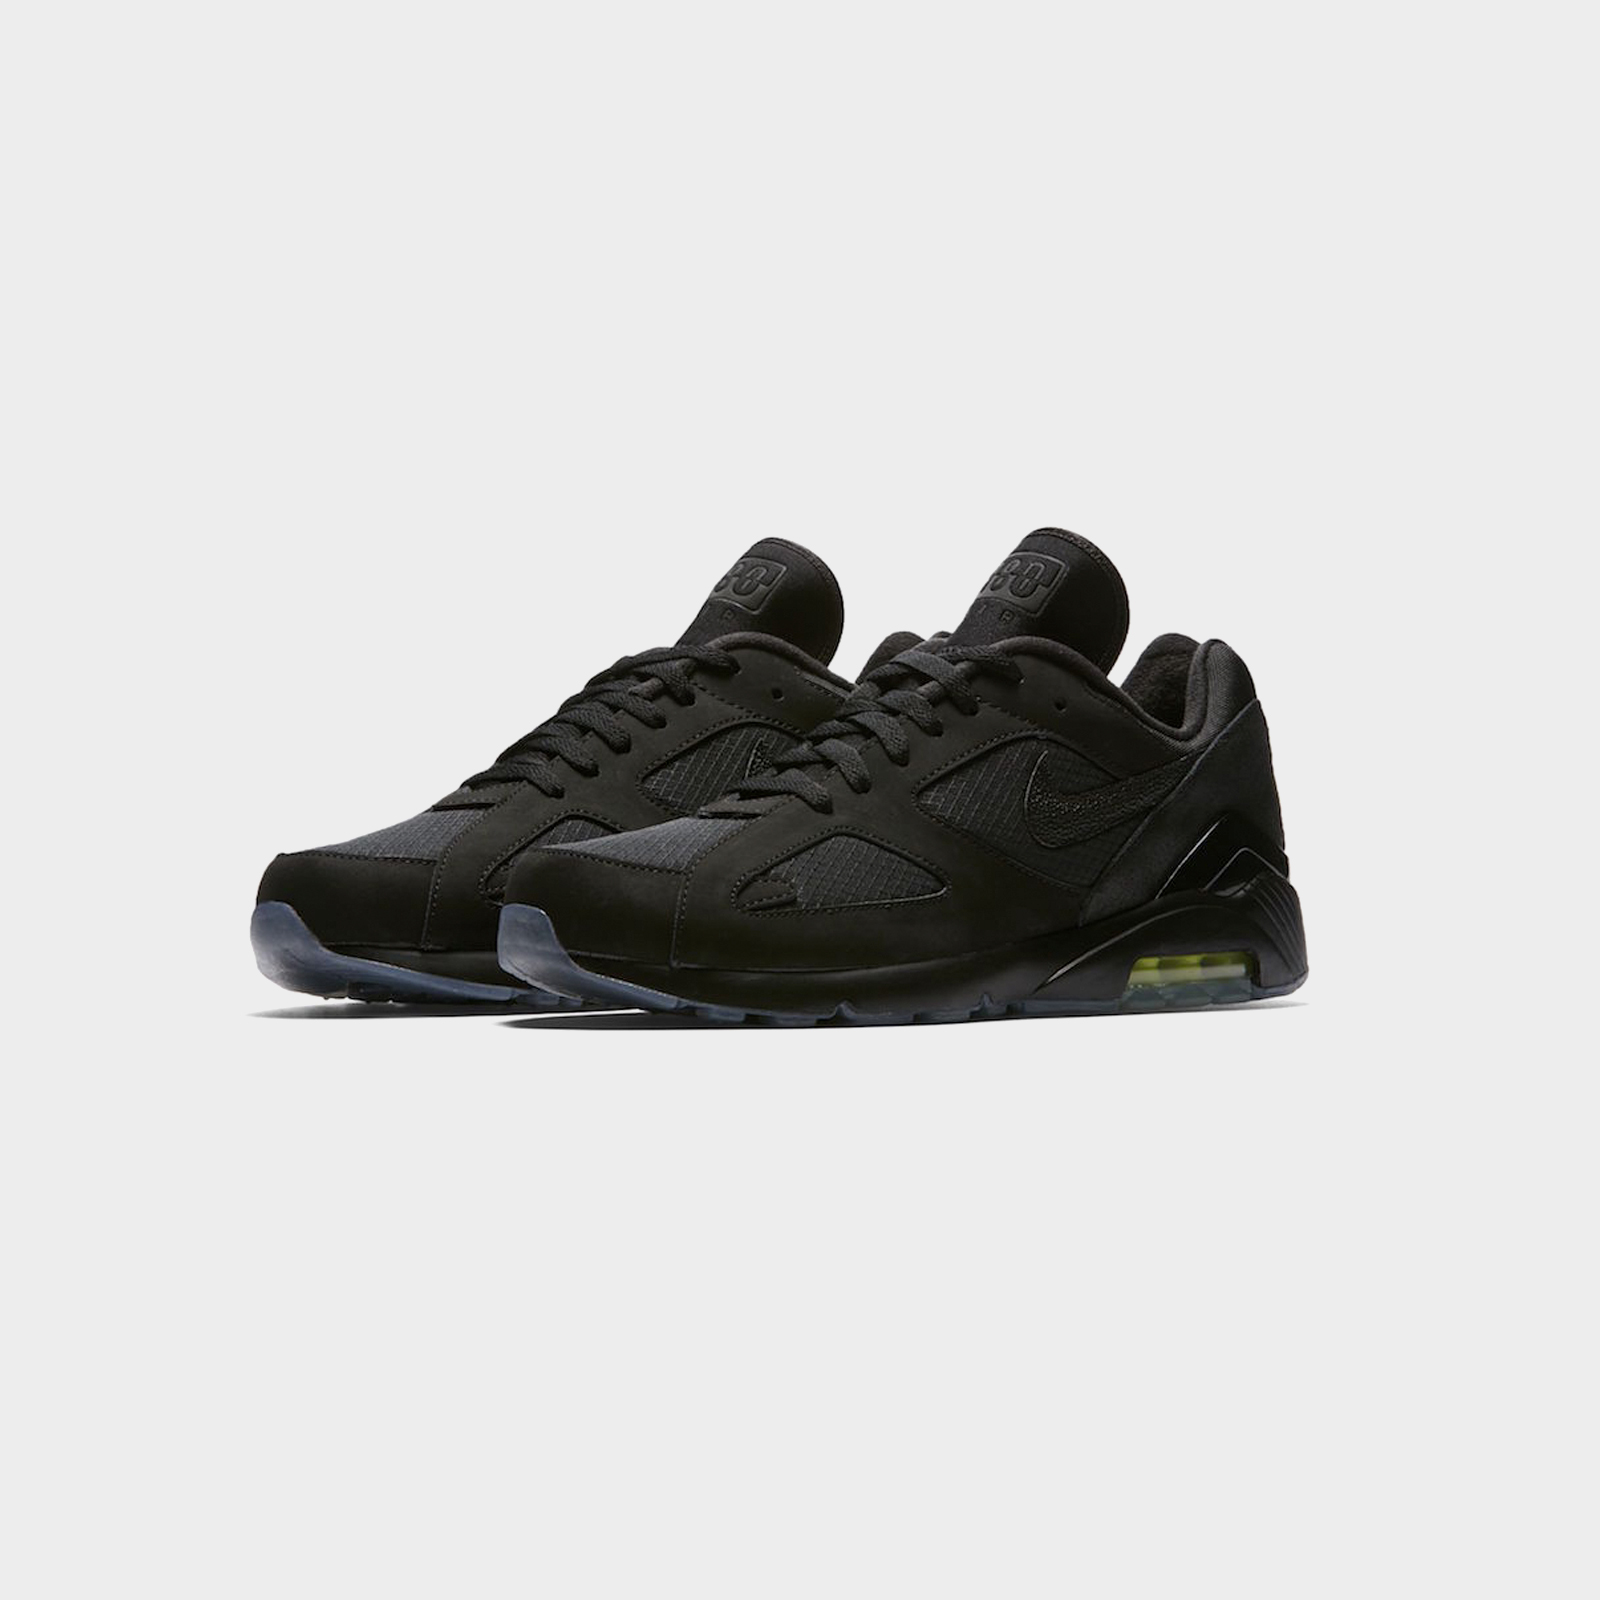 3986e781156d8d Nike Air Max 180 Night Ops - Aq6104-001 - Sneakersnstuff